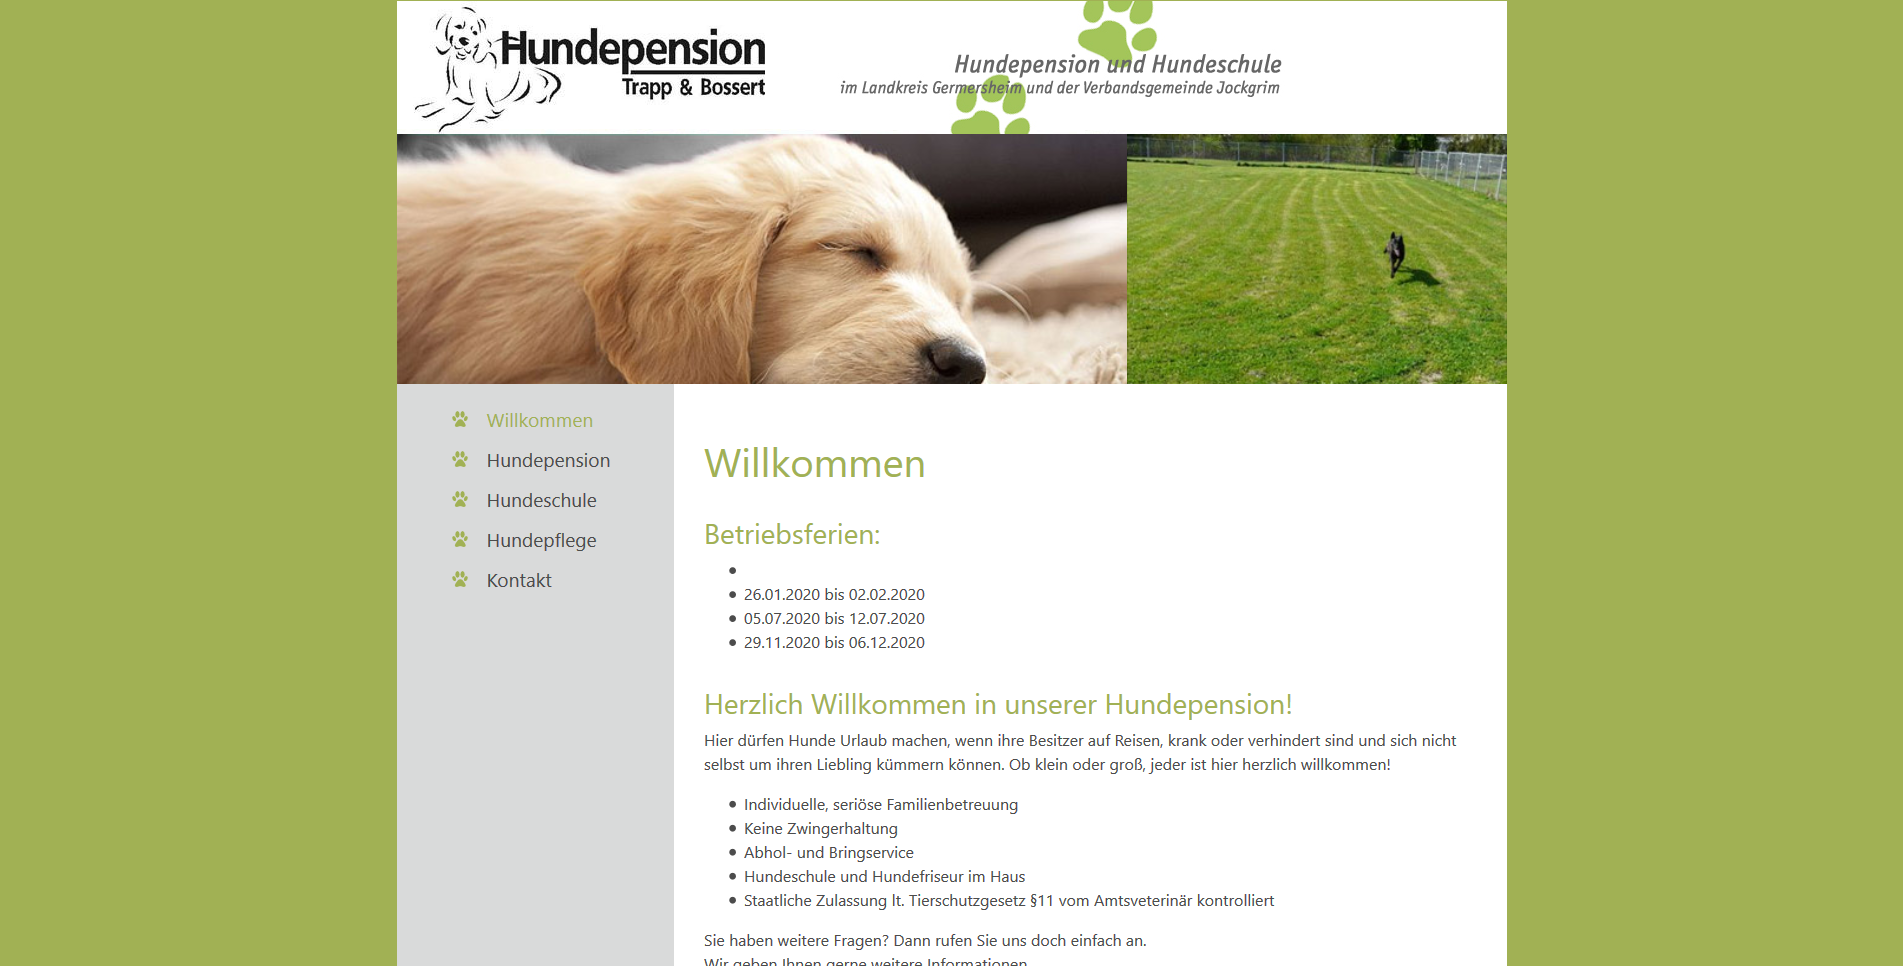 Hundepension Trapp & Bossert